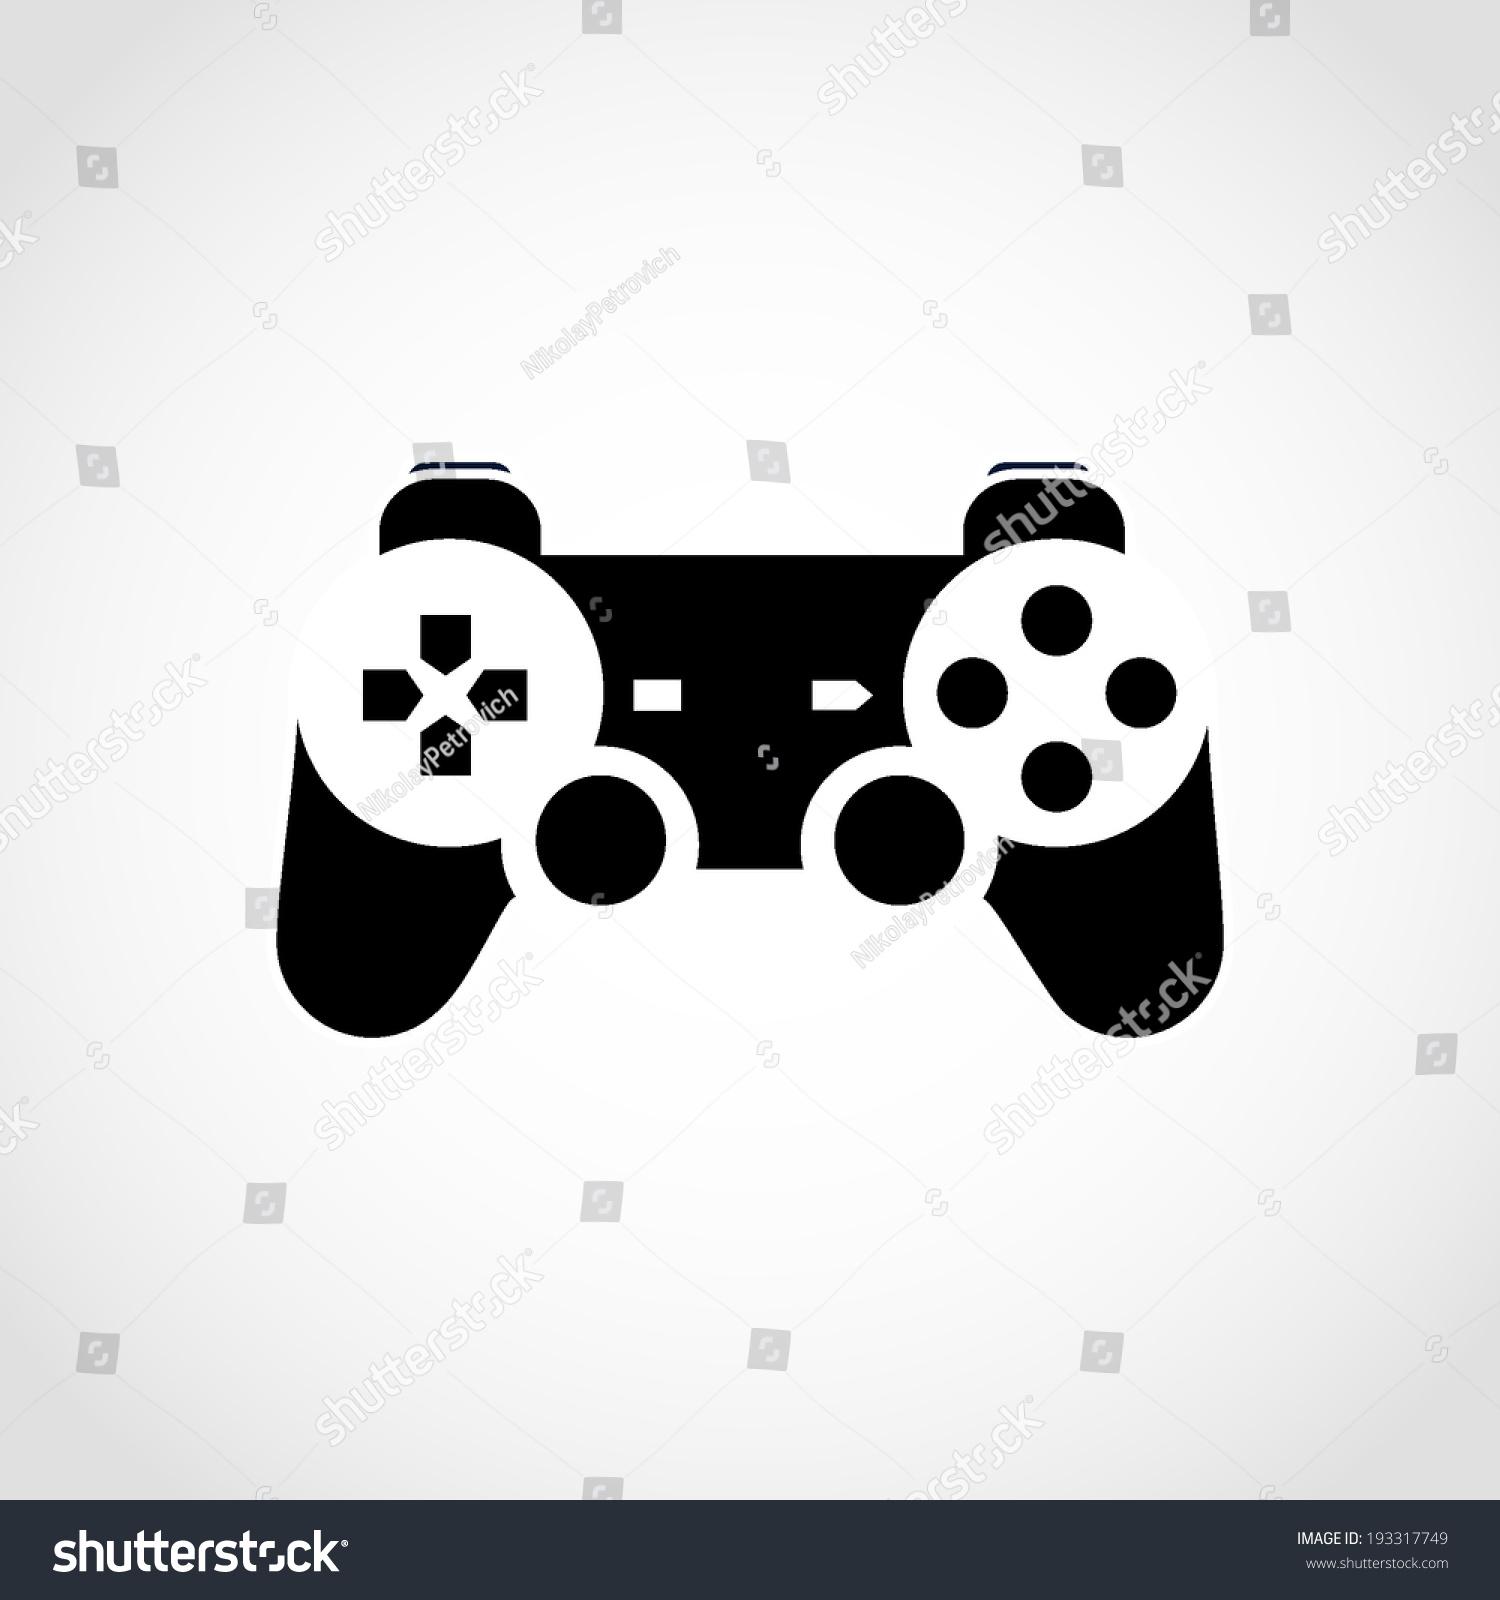 Gaming Joystick Icon Isolated On White Technology SignsSymbols 1500x1600